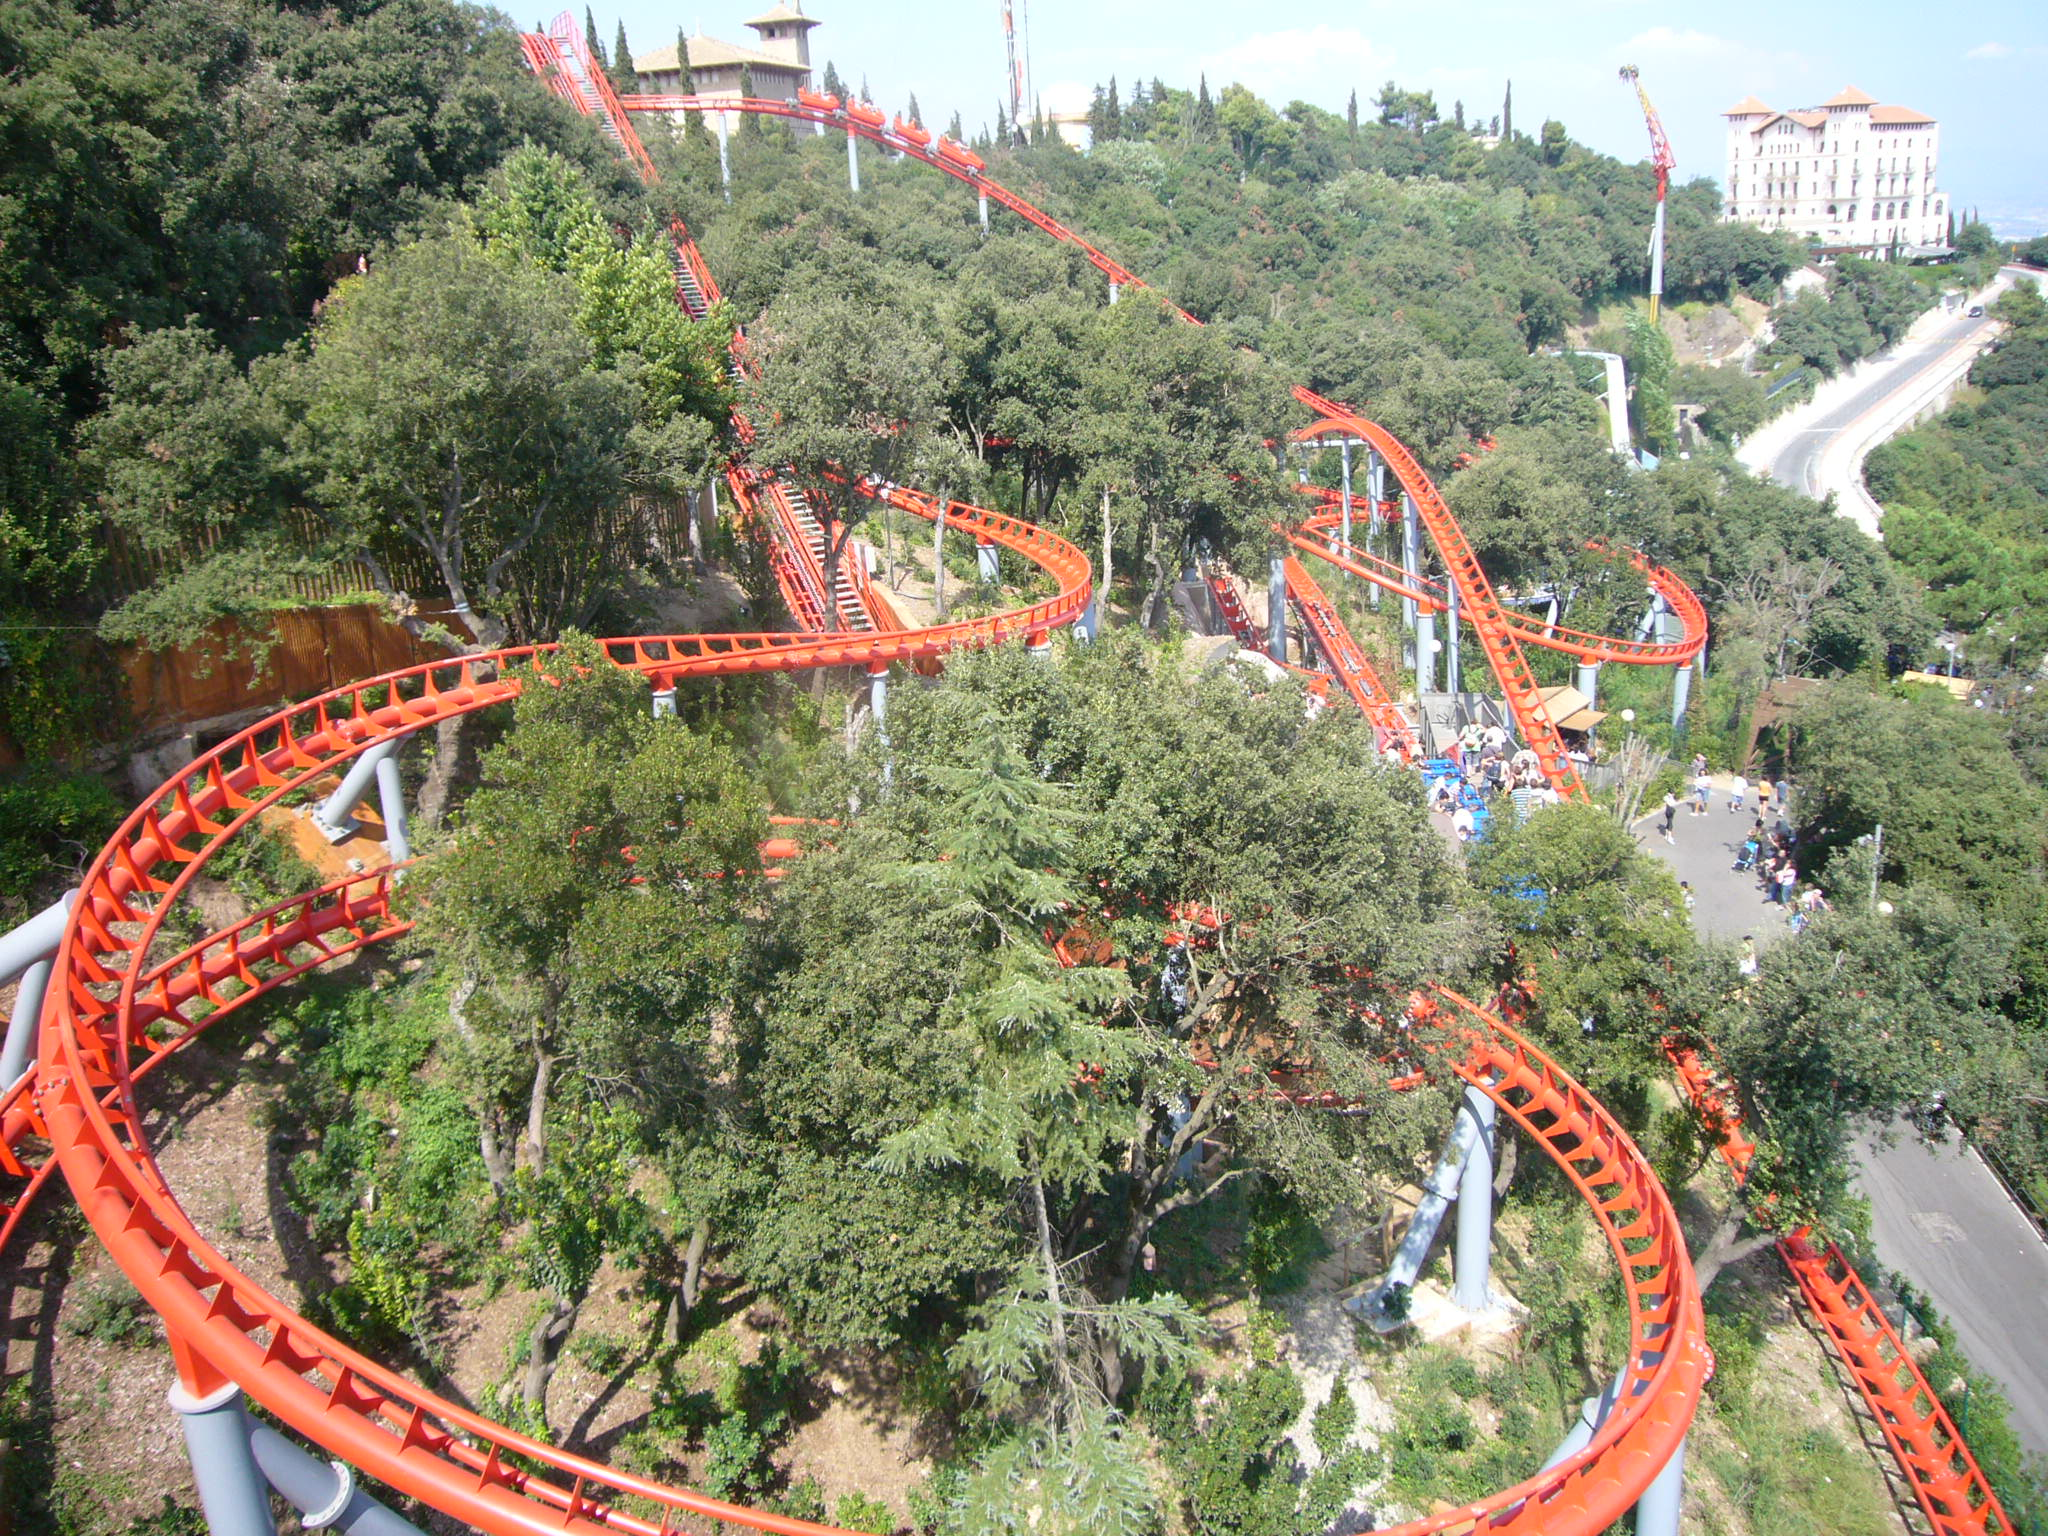 Muntanya Russa Tibidabo Amusement Park Wikipedia